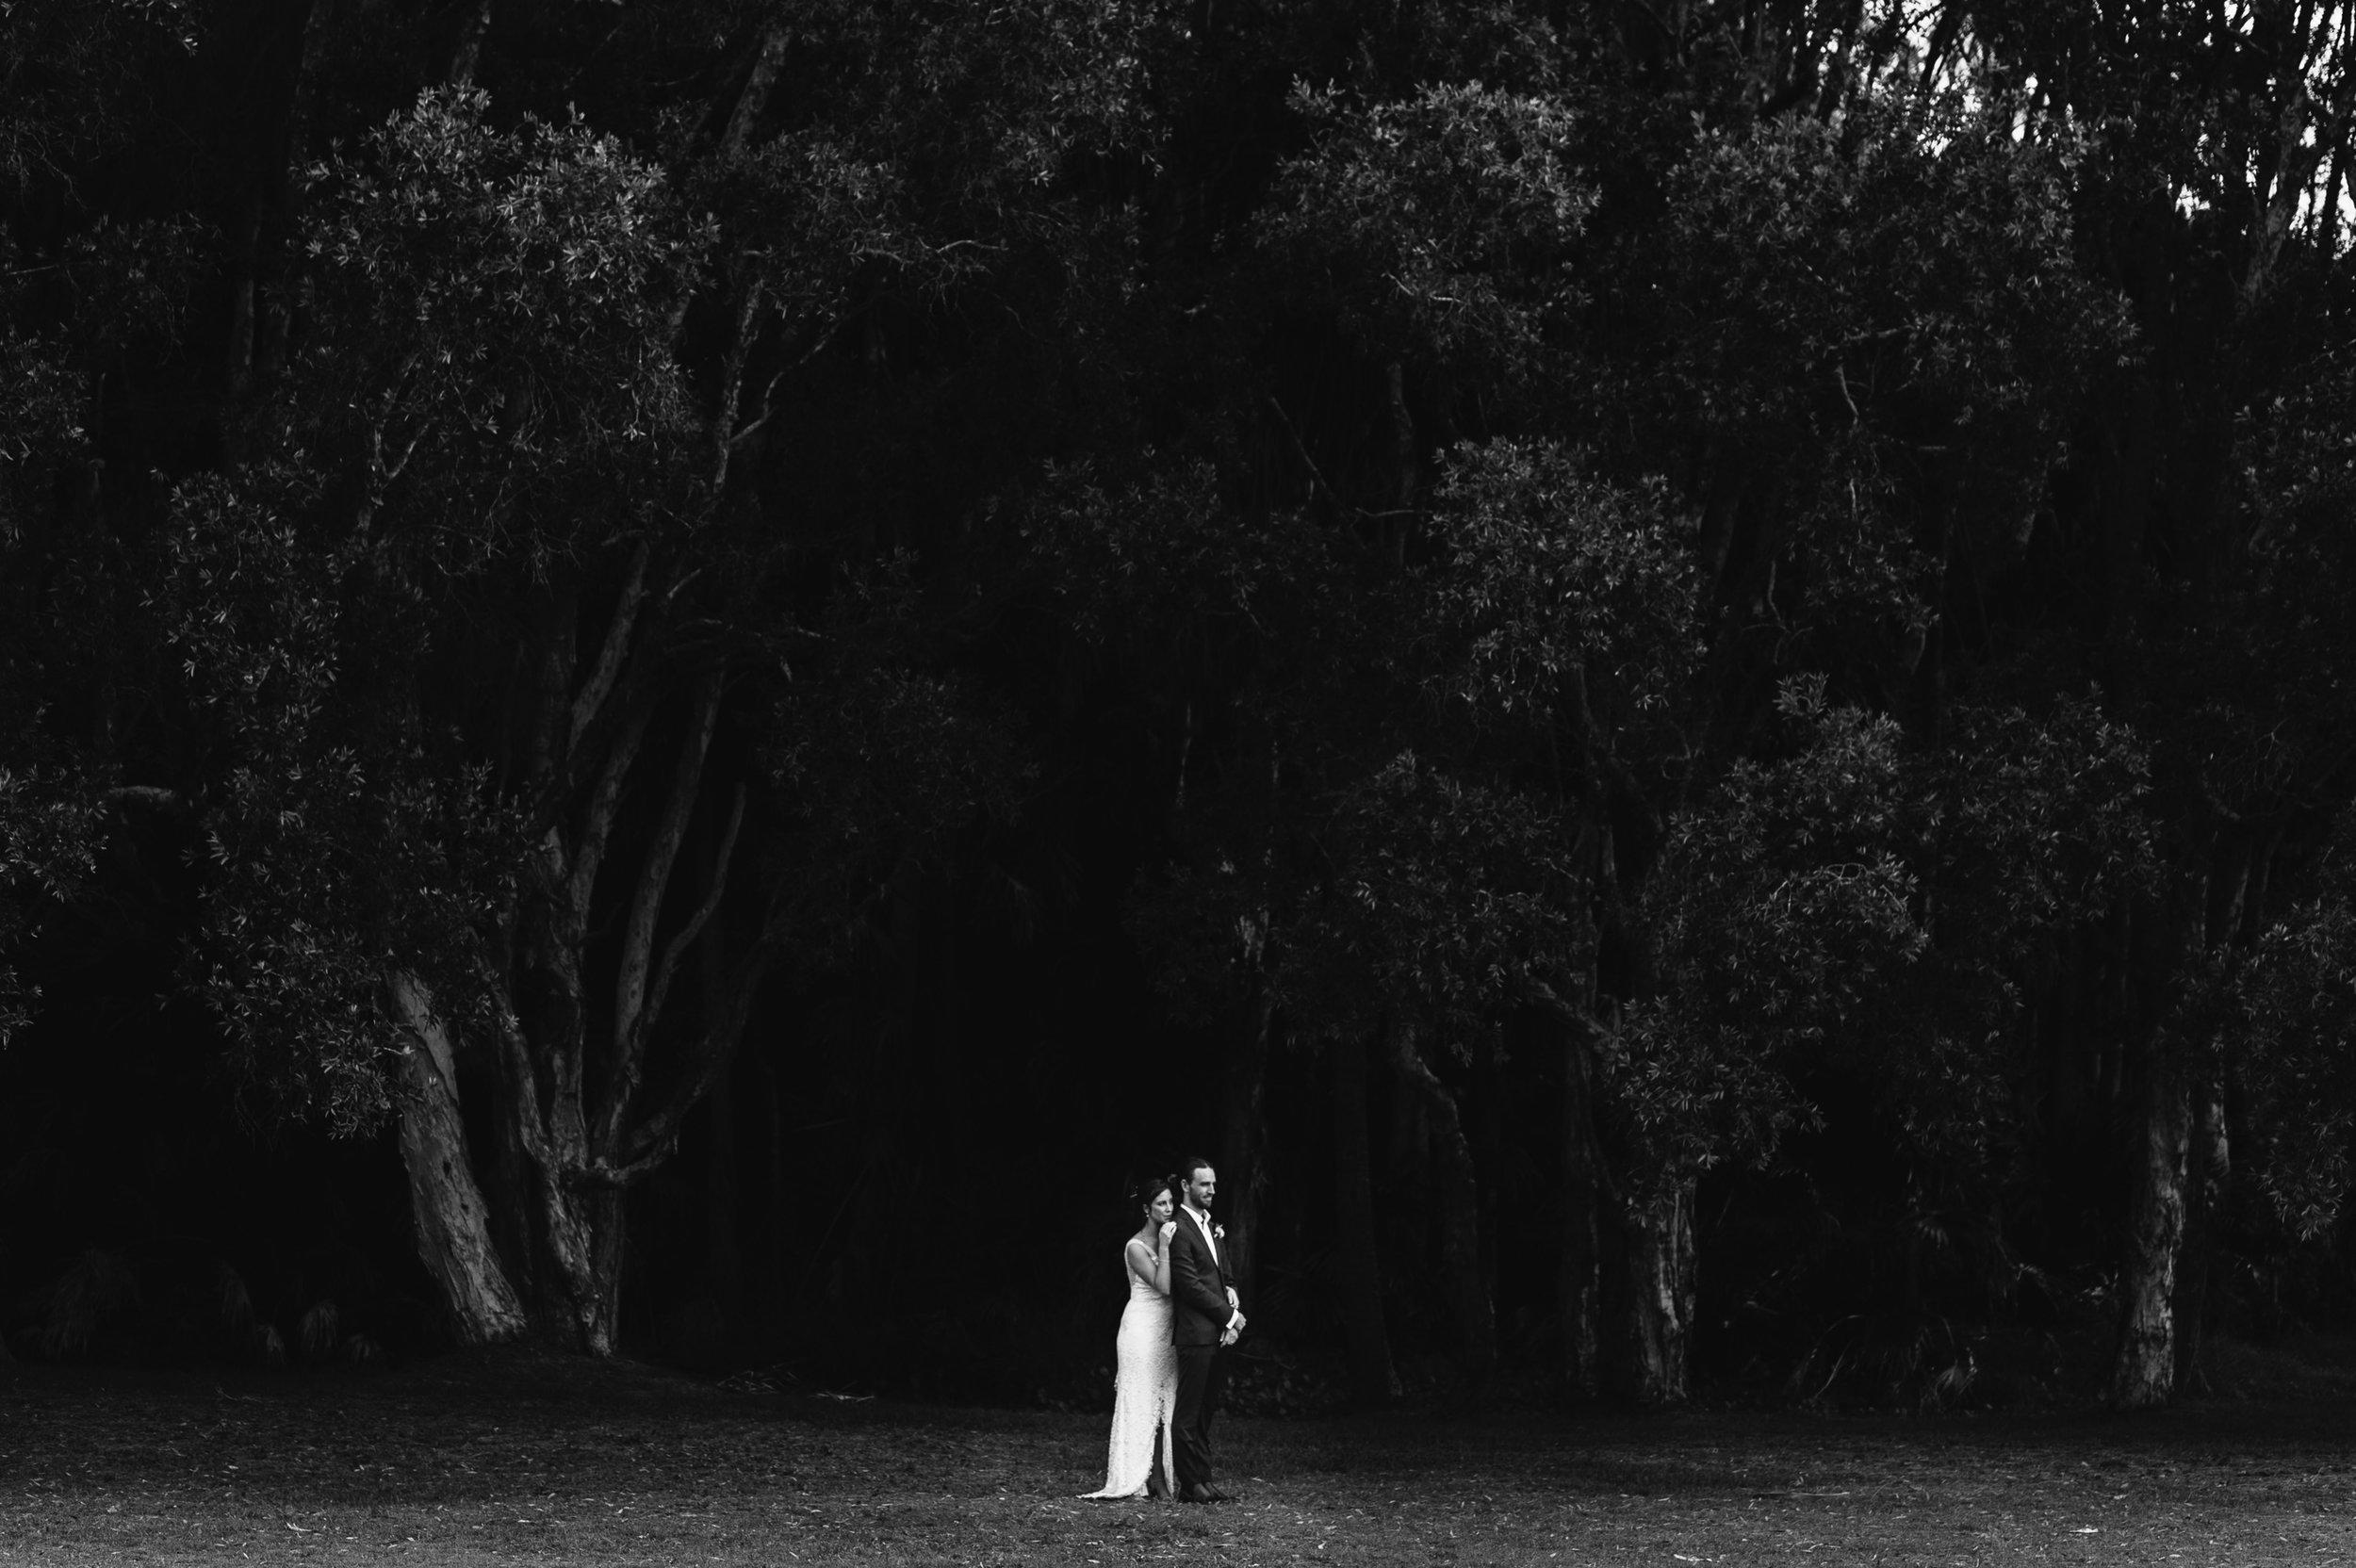 weddings by atelier photography-wedding-04 copy.jpg